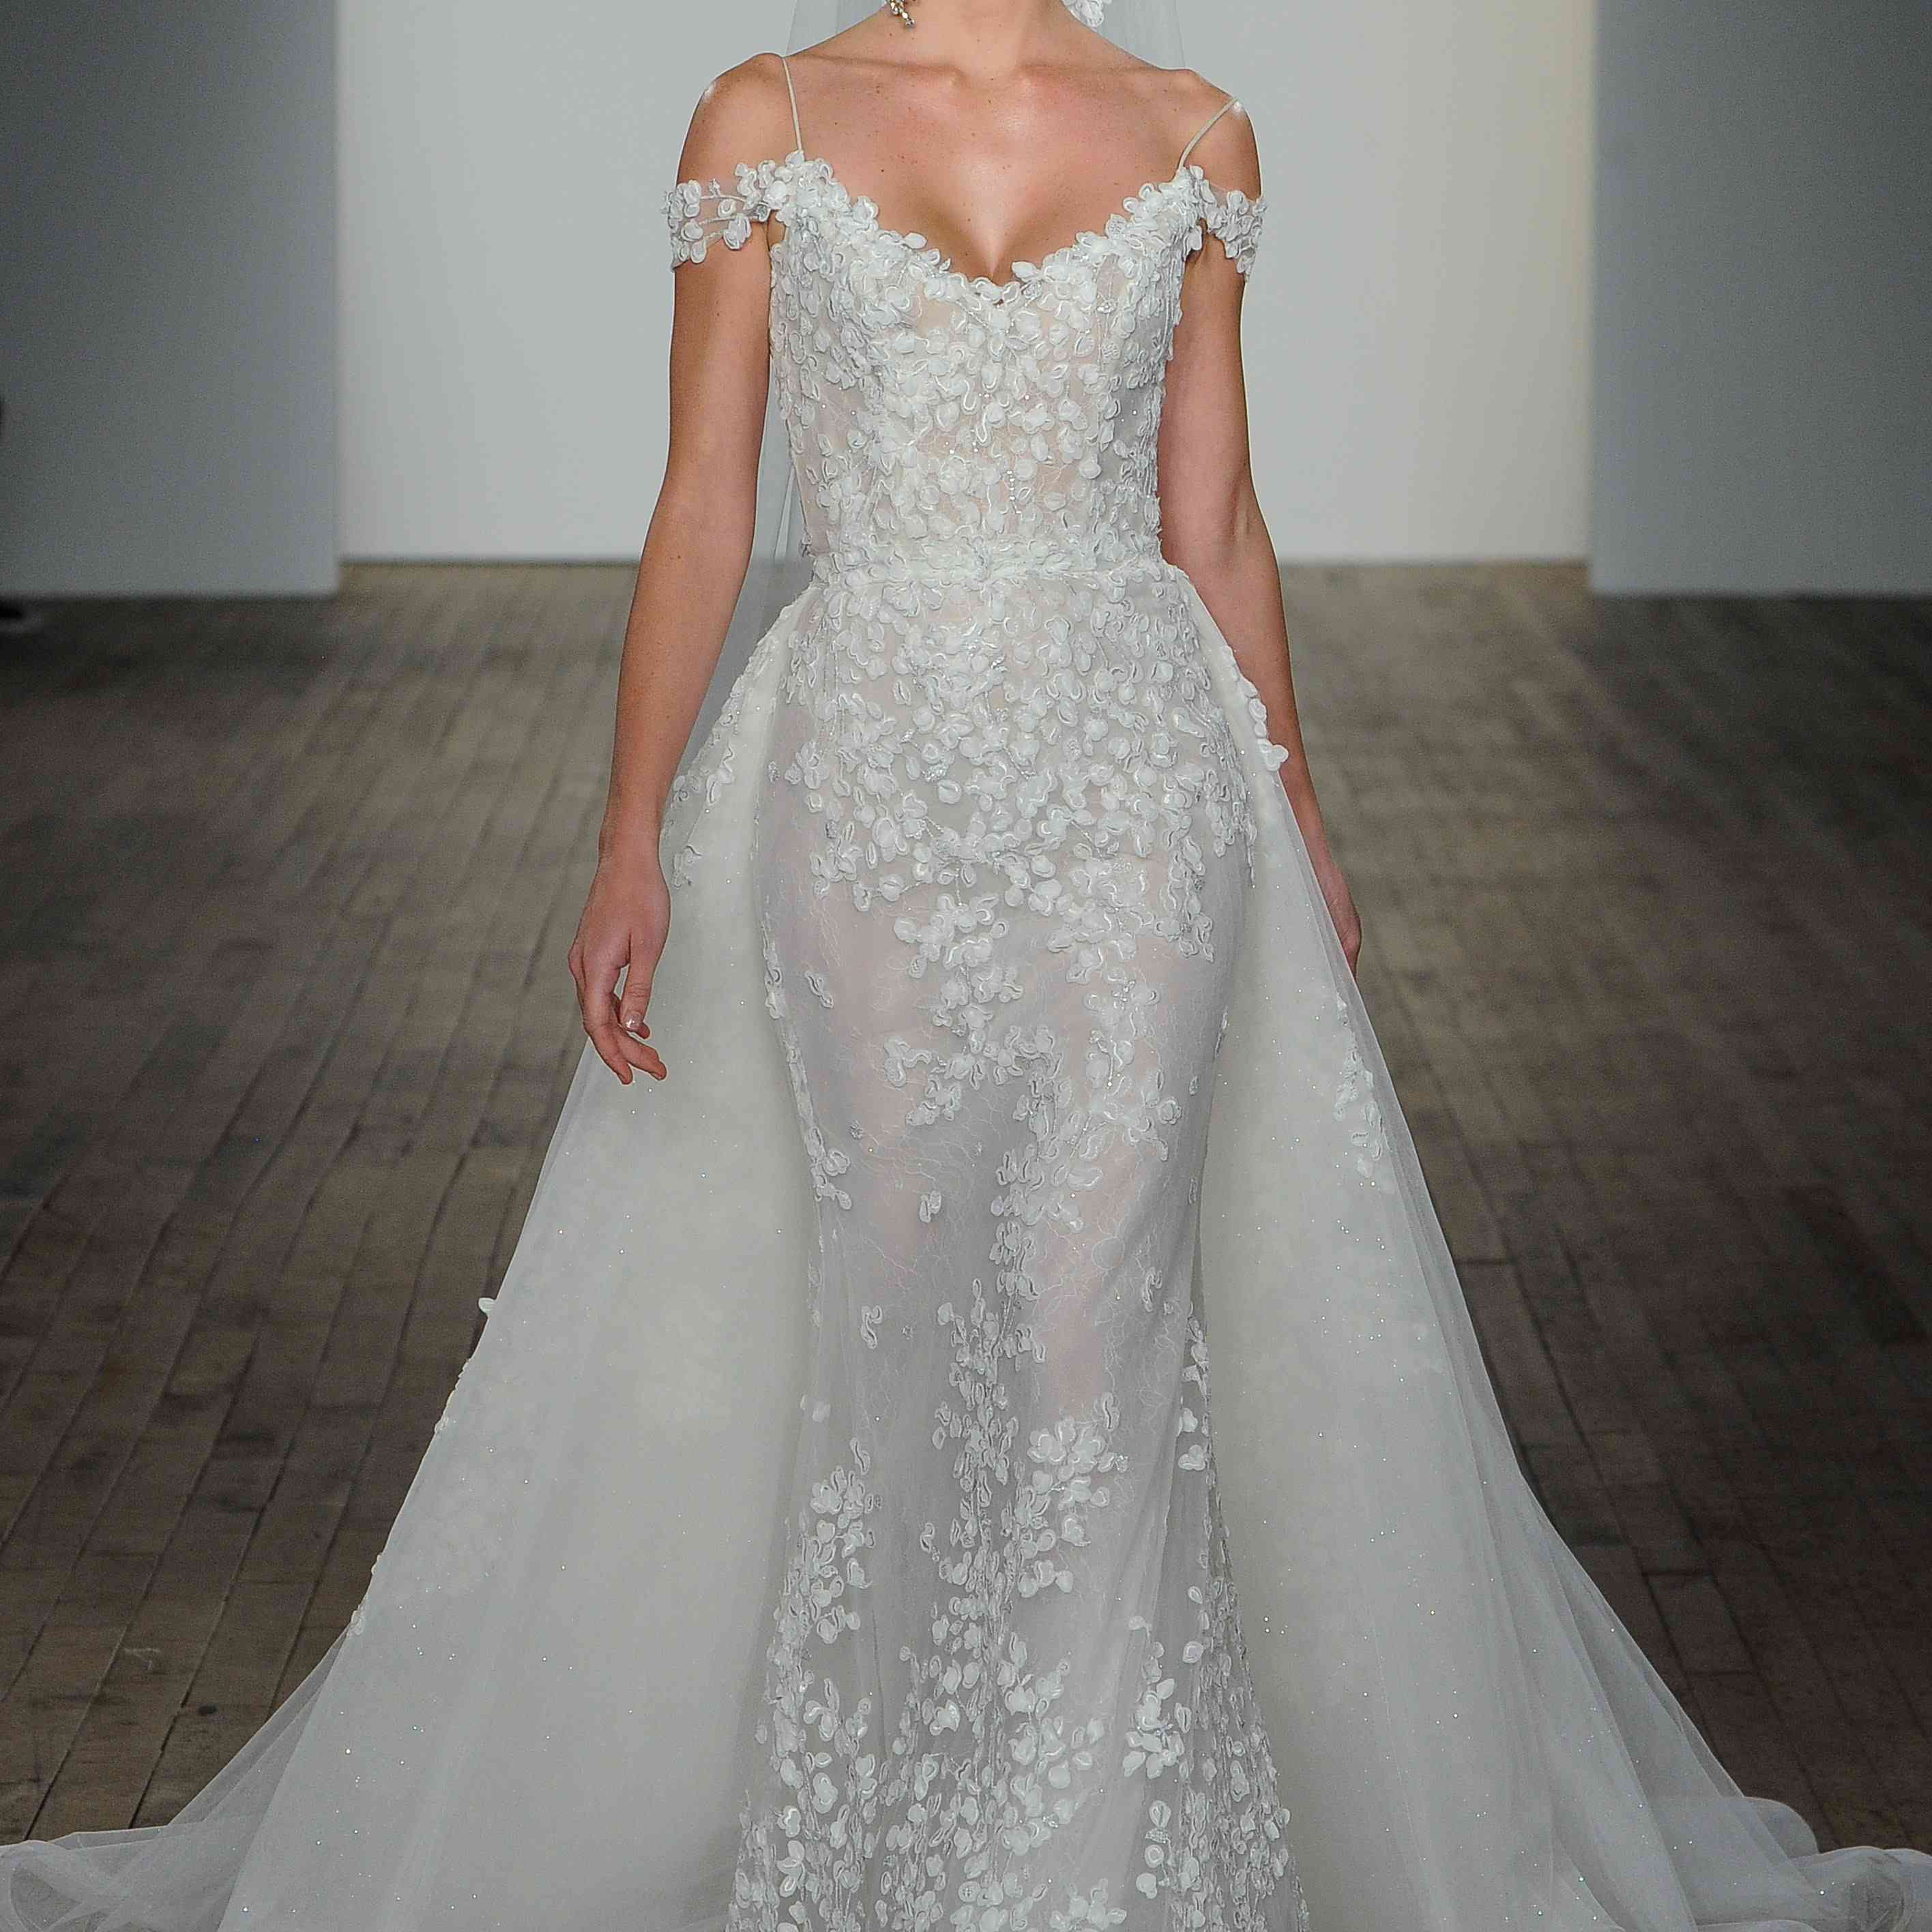 Olivia off-the-shoulder wedding dress lazaro